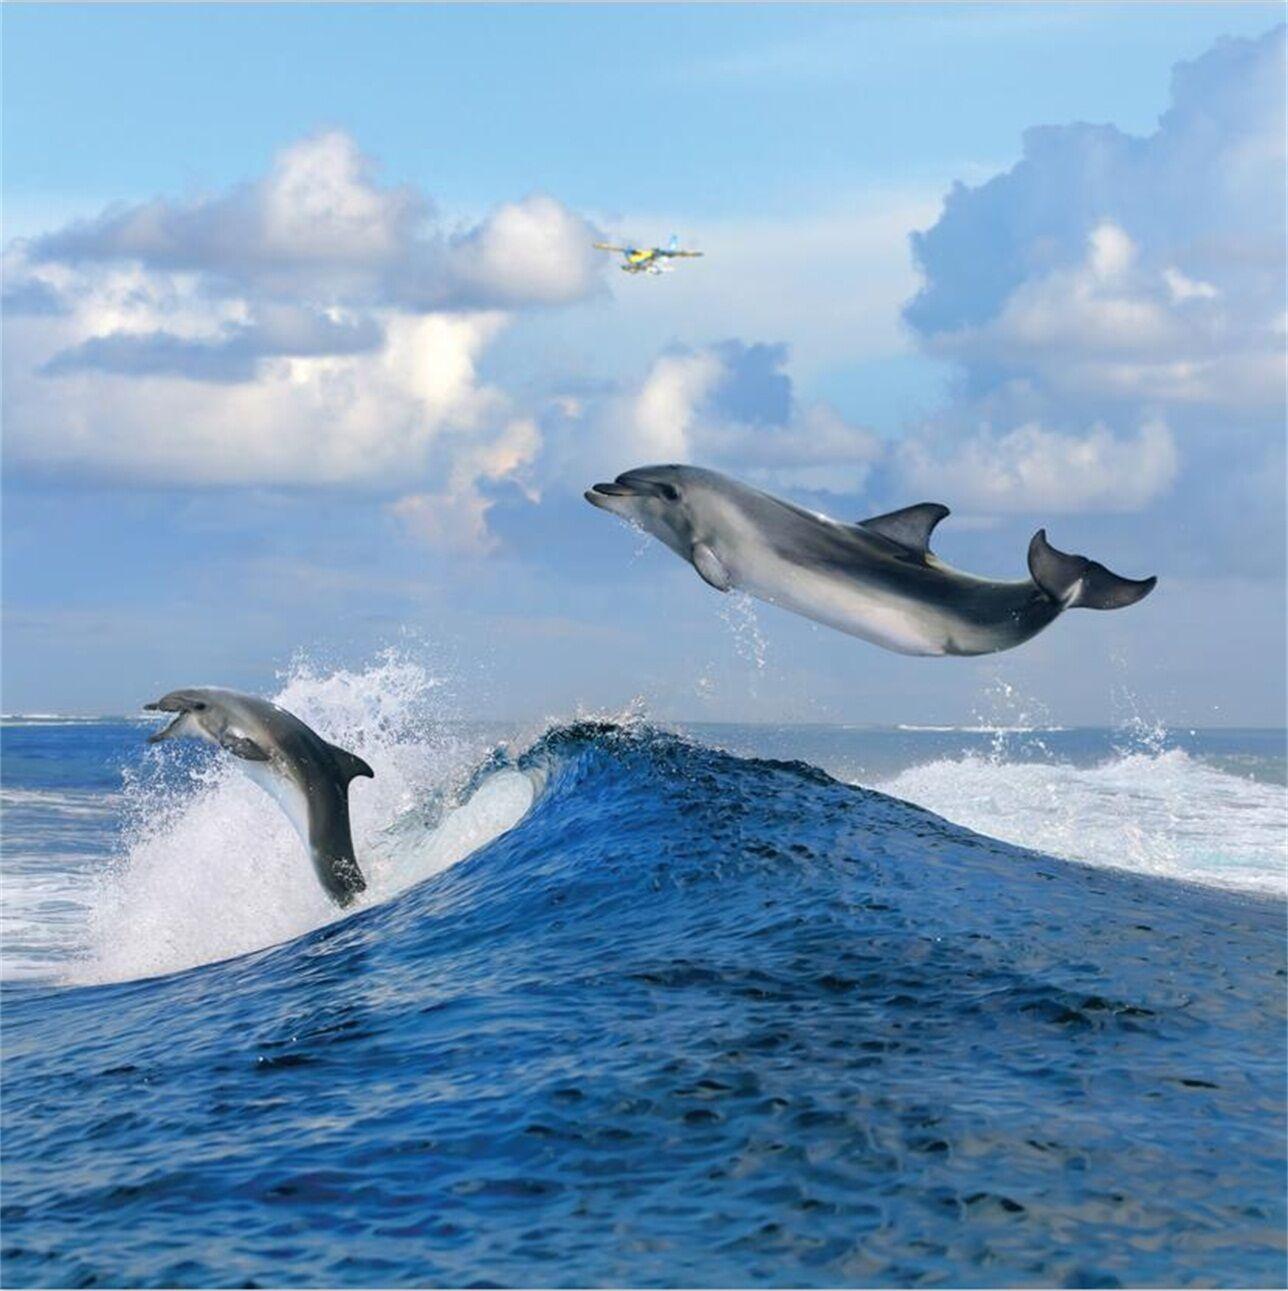 3D Jumping Dolphins 10 WallPaper Murals Wall Print Decal Wall Deco AJ WALLPAPER